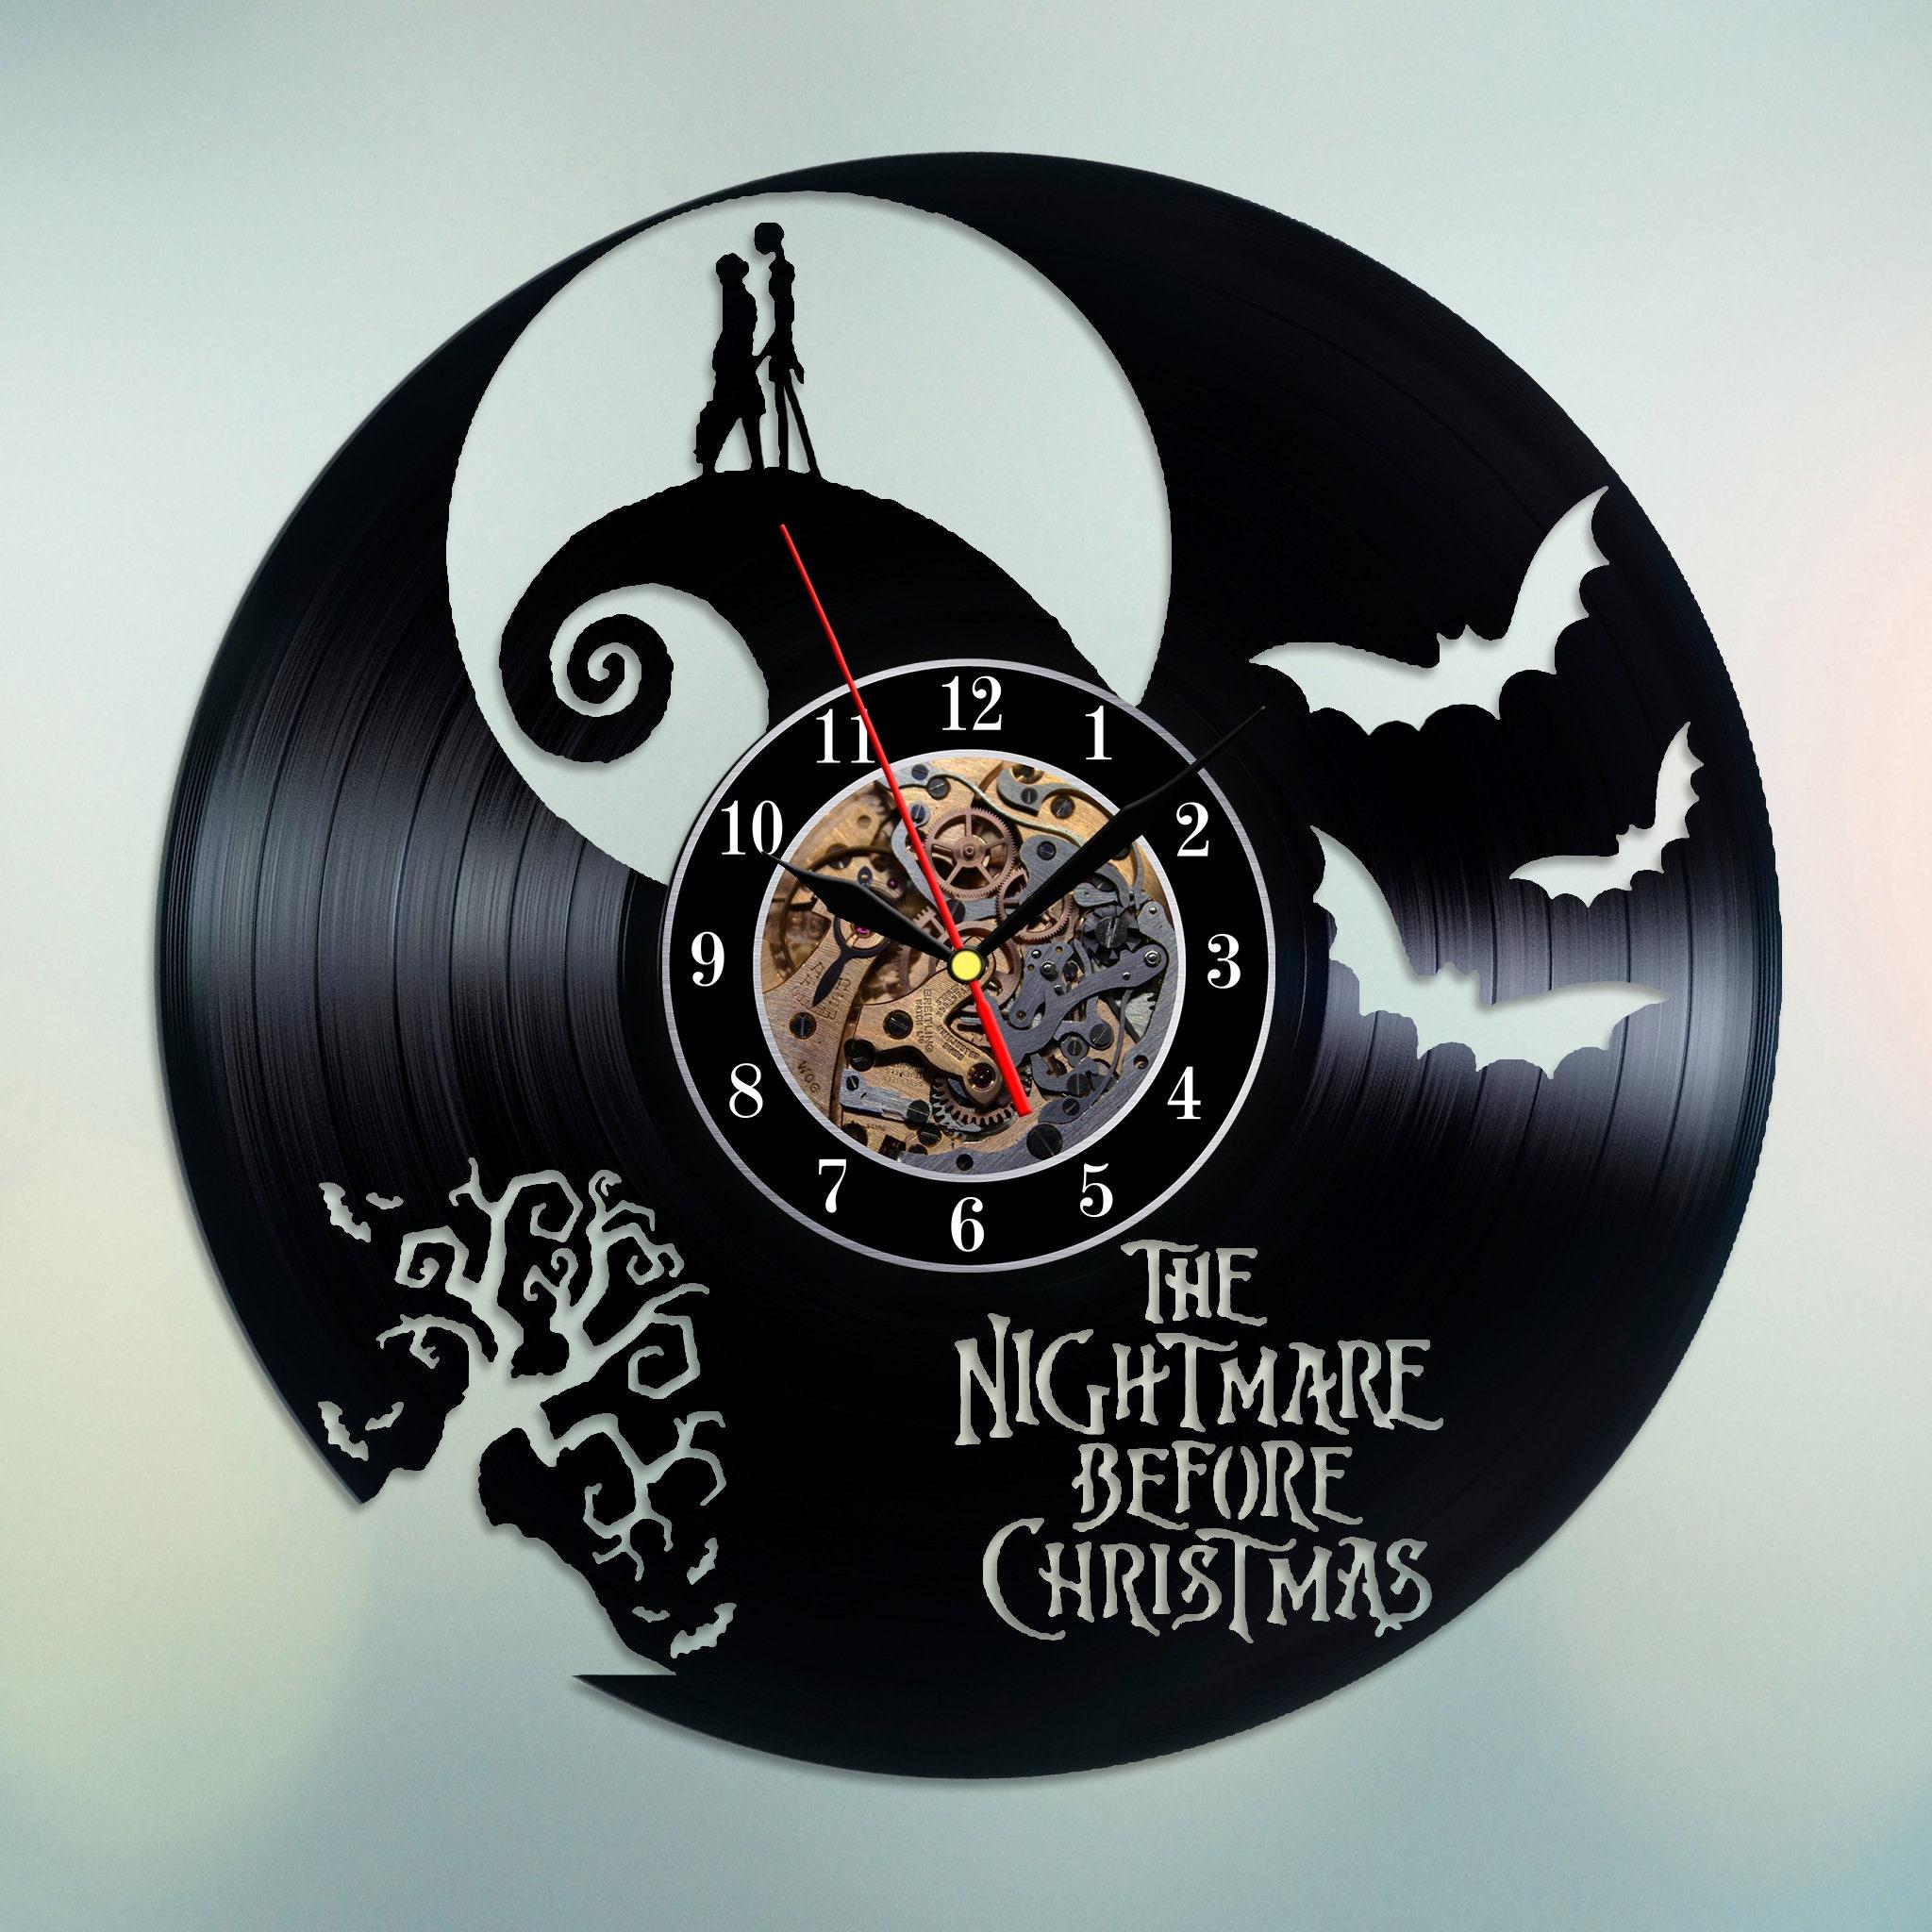 The Nightmare Before Christmas wall clock Vinyl wall clock NBC